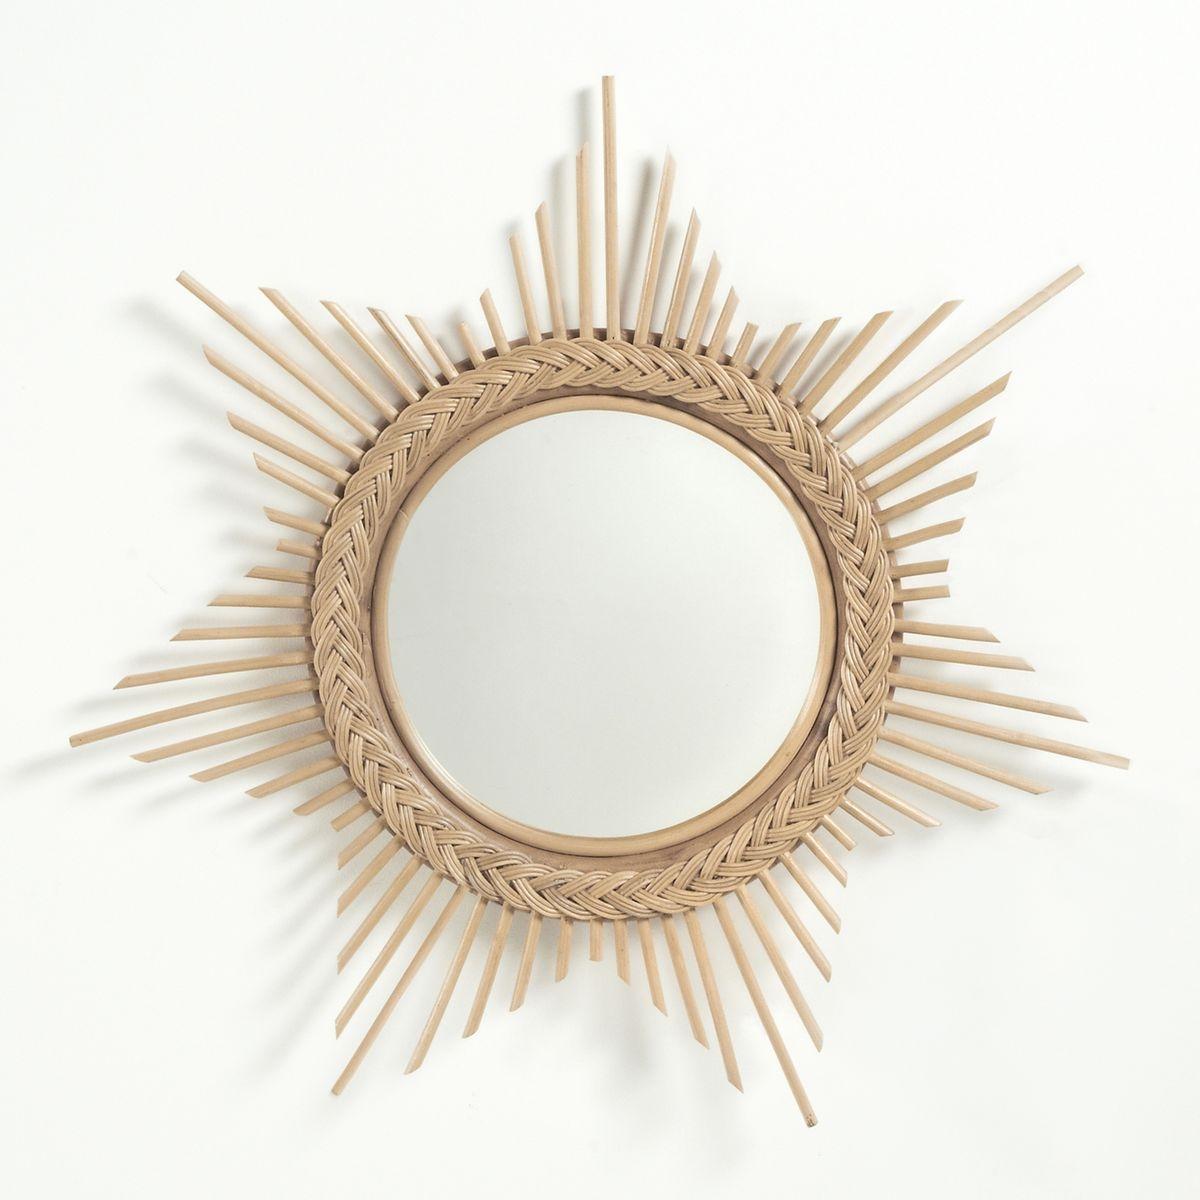 Miroir soleil en rotin for Miroir soleil prix